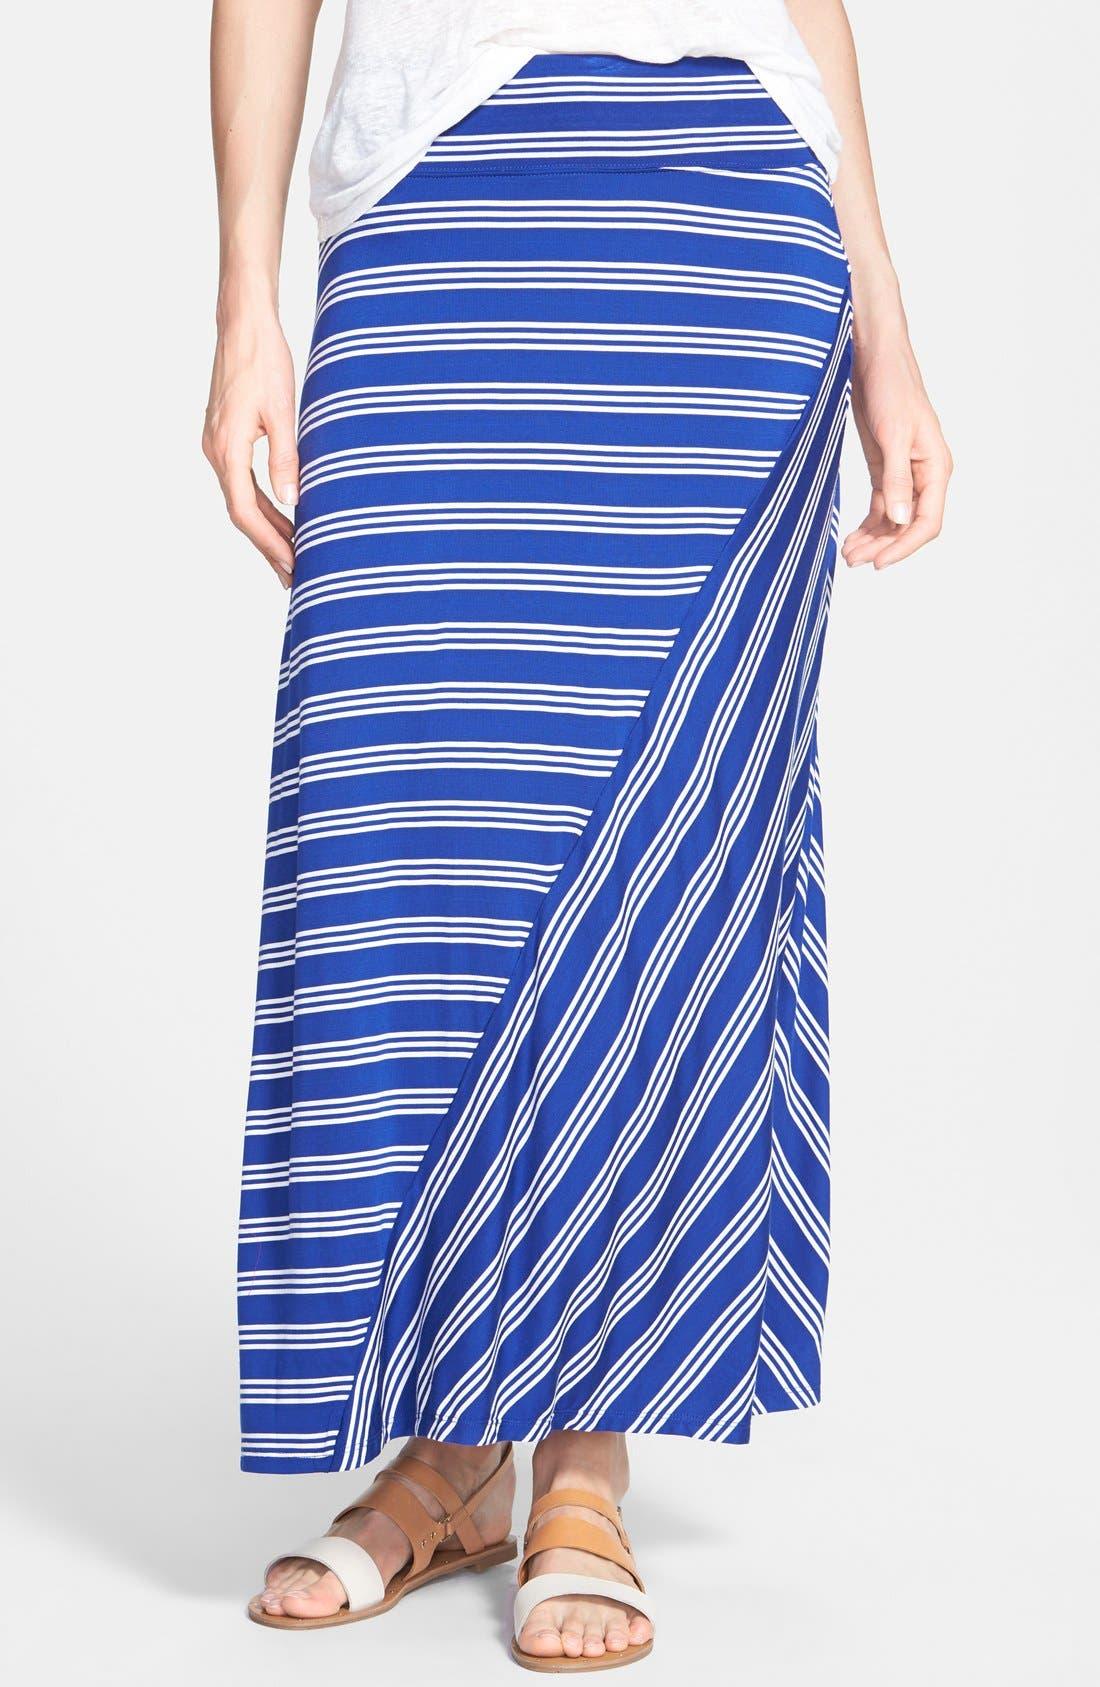 Alternate Image 1 Selected - kensie Stripe Stretch Knit Maxi Skirt